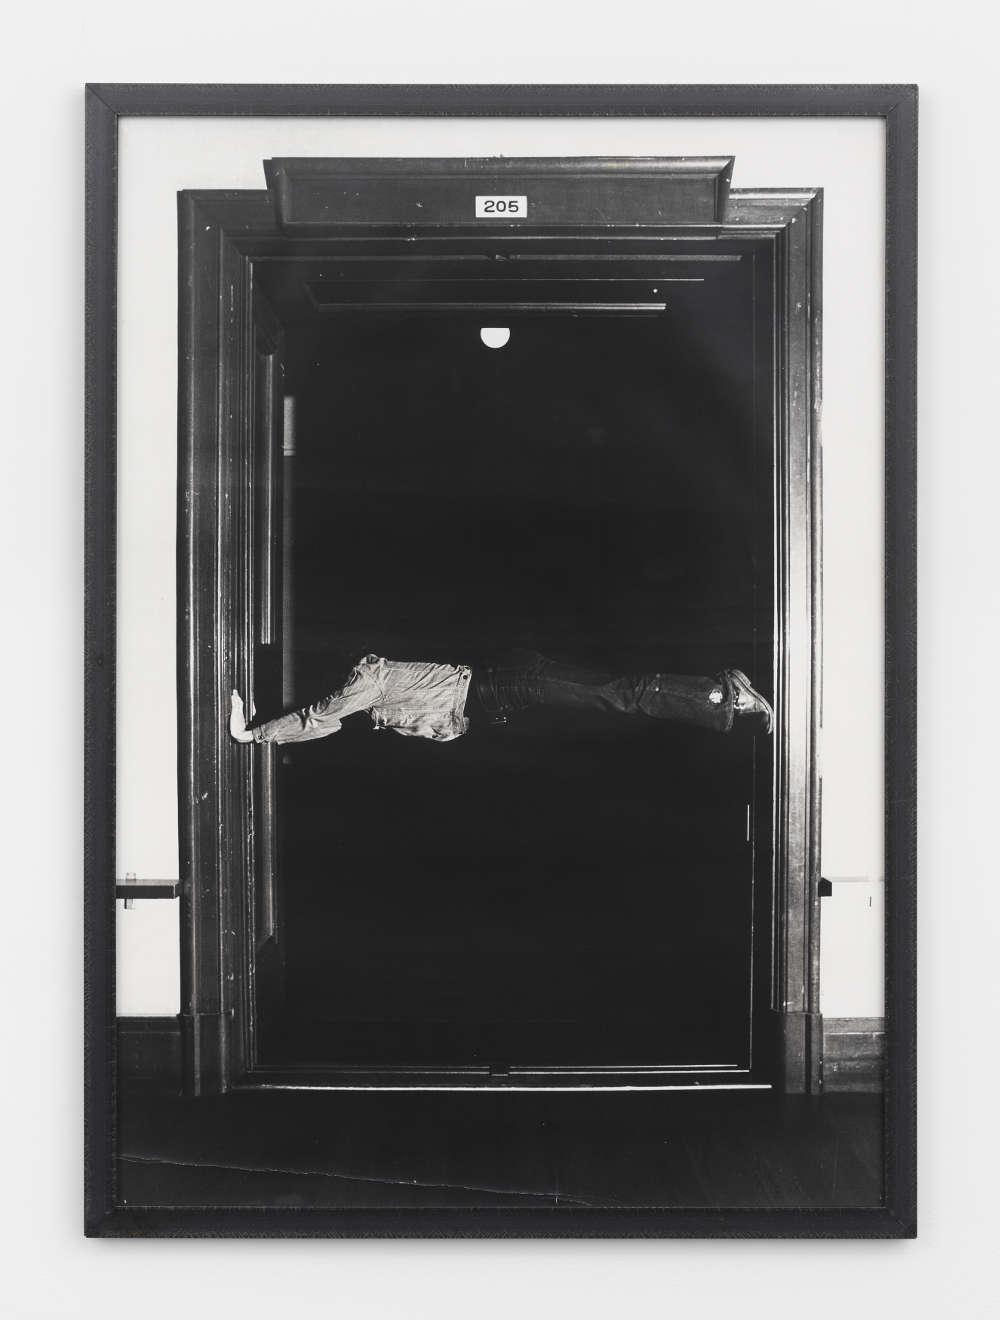 Keiji Uematsu, Horizontal Position, 1973. Gelatin silver print, unique, vintage 102.4 x 72.4 cm (40 1/4 x 28 1/2 in.) Courtesy the artist and Simon Lee Gallery